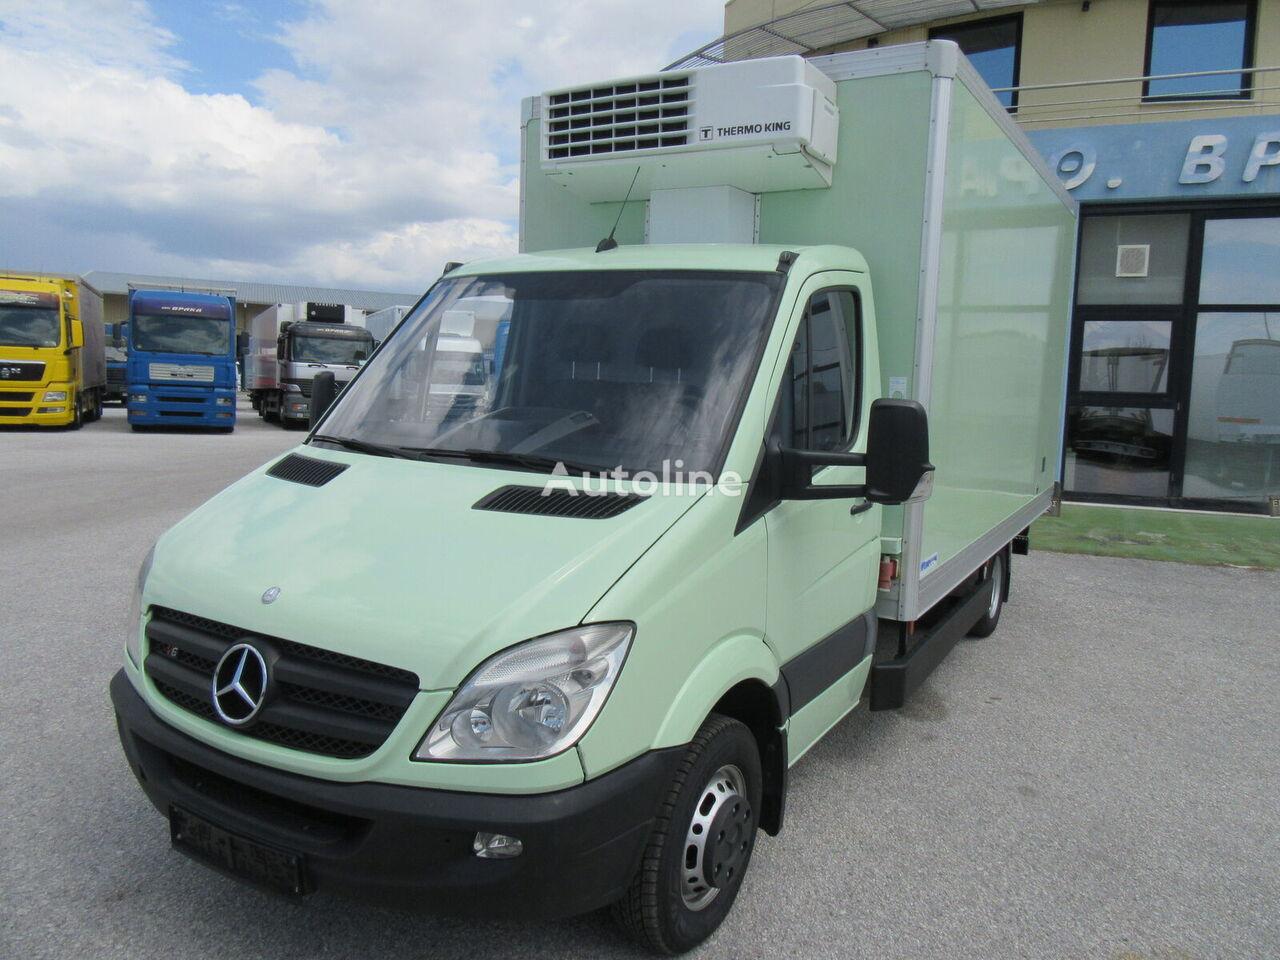 MERCEDES-BENZ 519 CDI / EURO 5 refrigerated truck